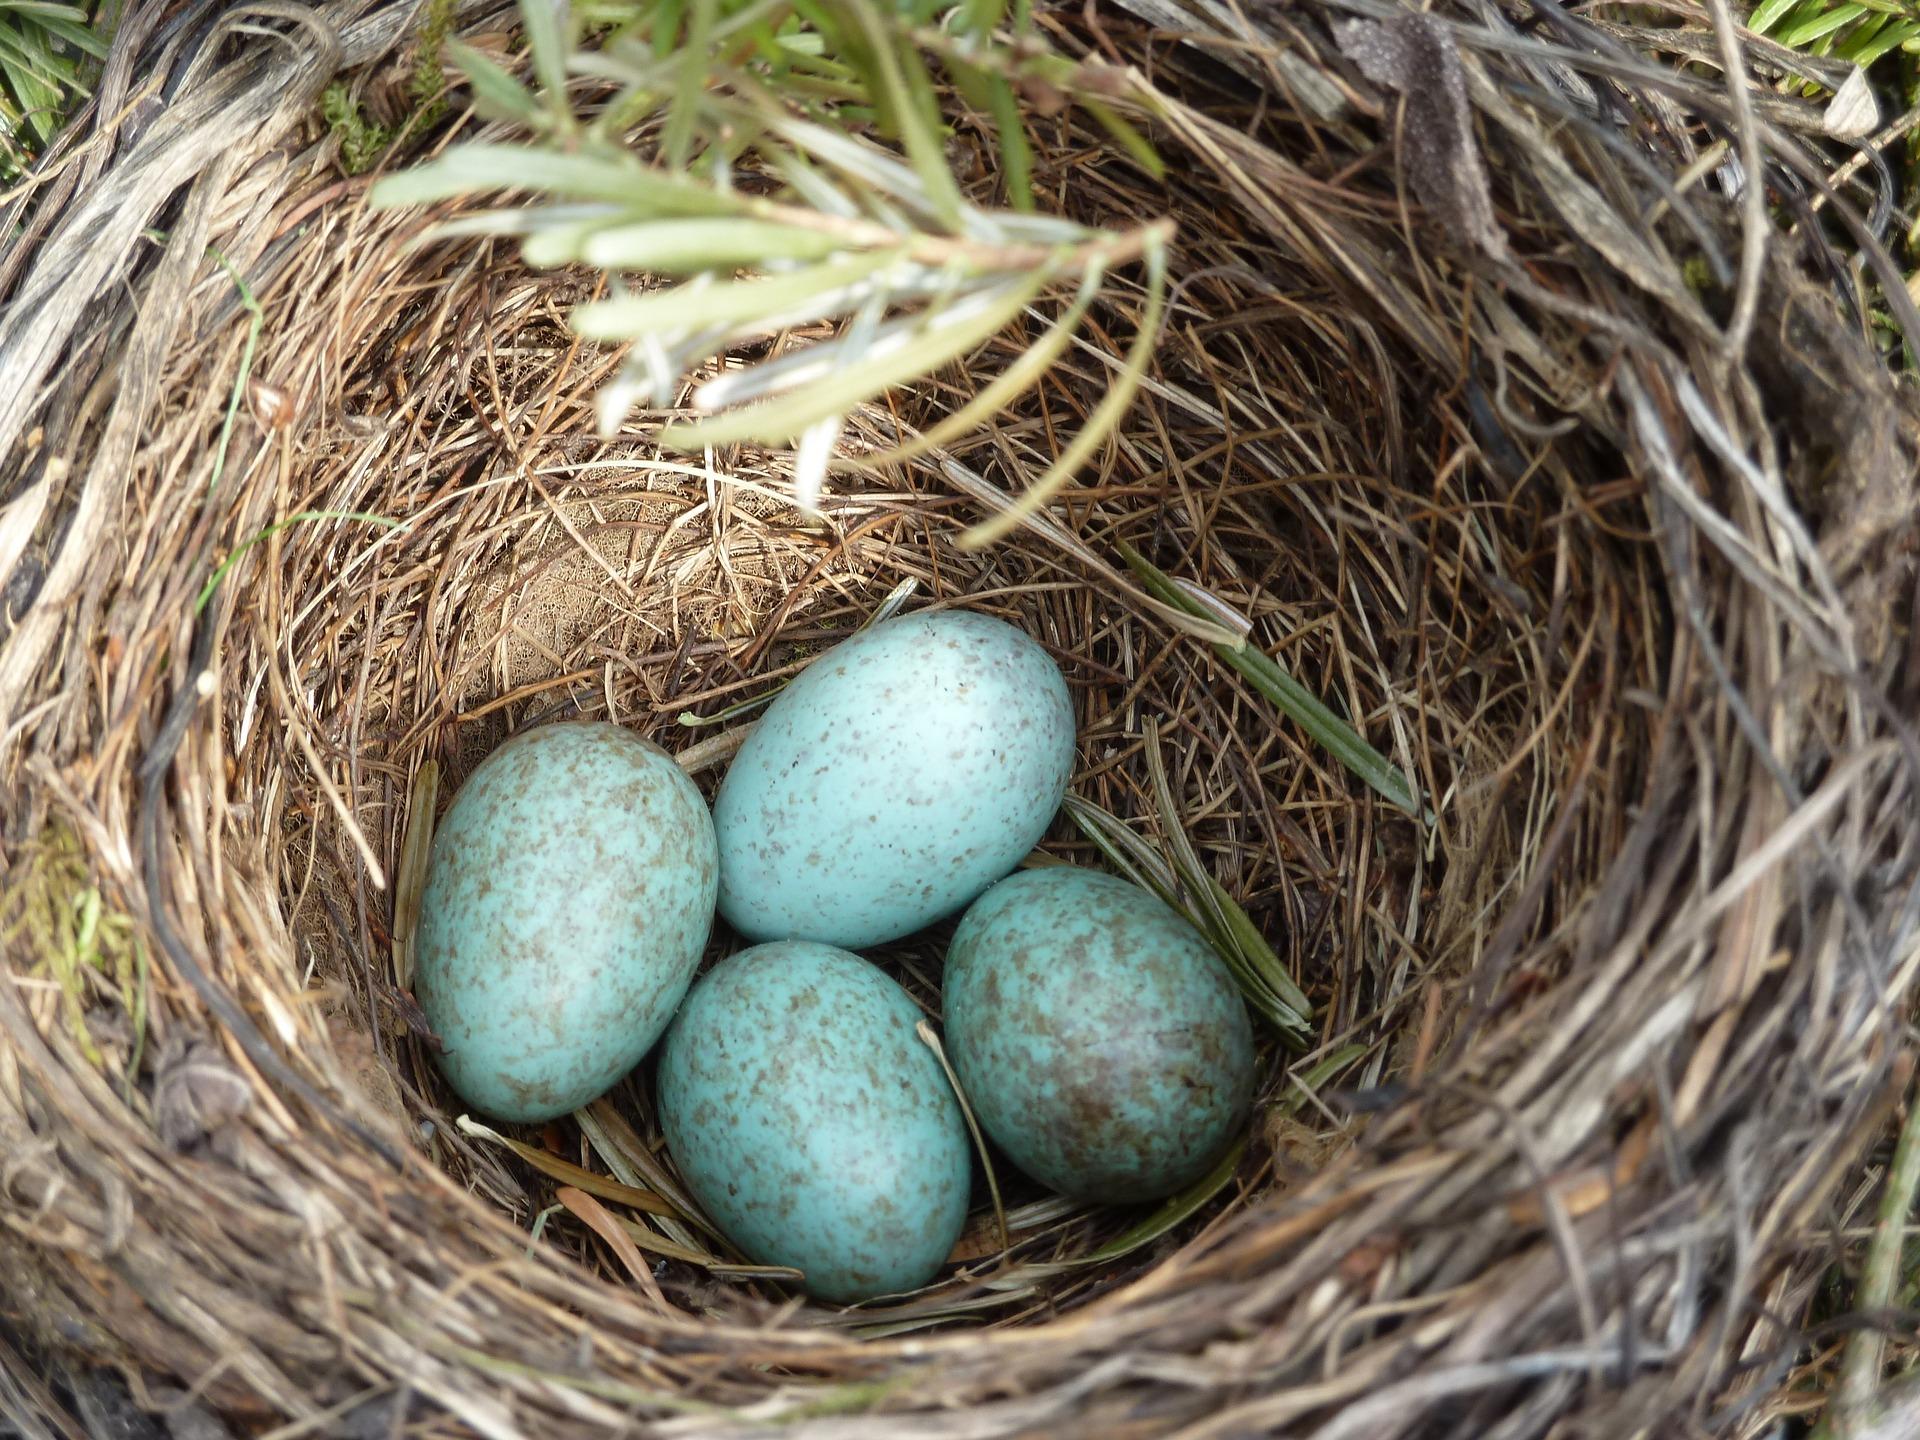 huevos de aves pequeñas